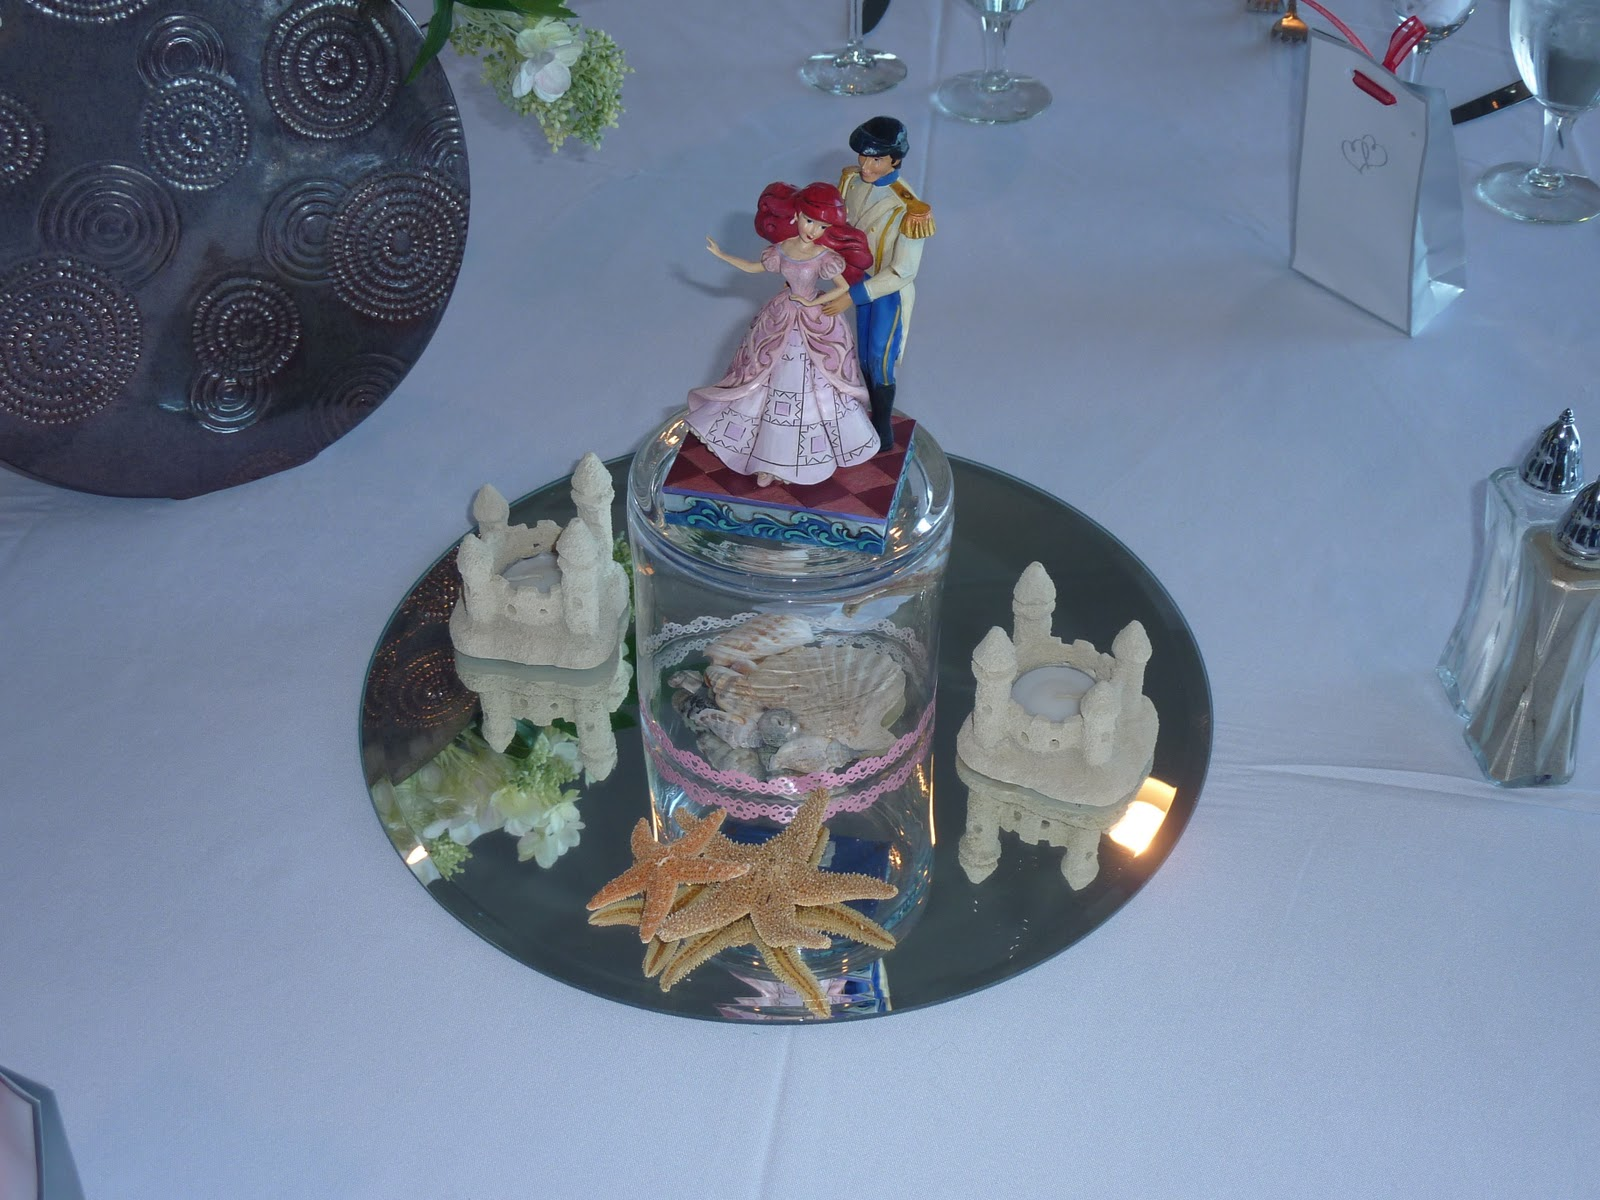 disney fun with sorcerer tink disney wedding reception decorations. Black Bedroom Furniture Sets. Home Design Ideas